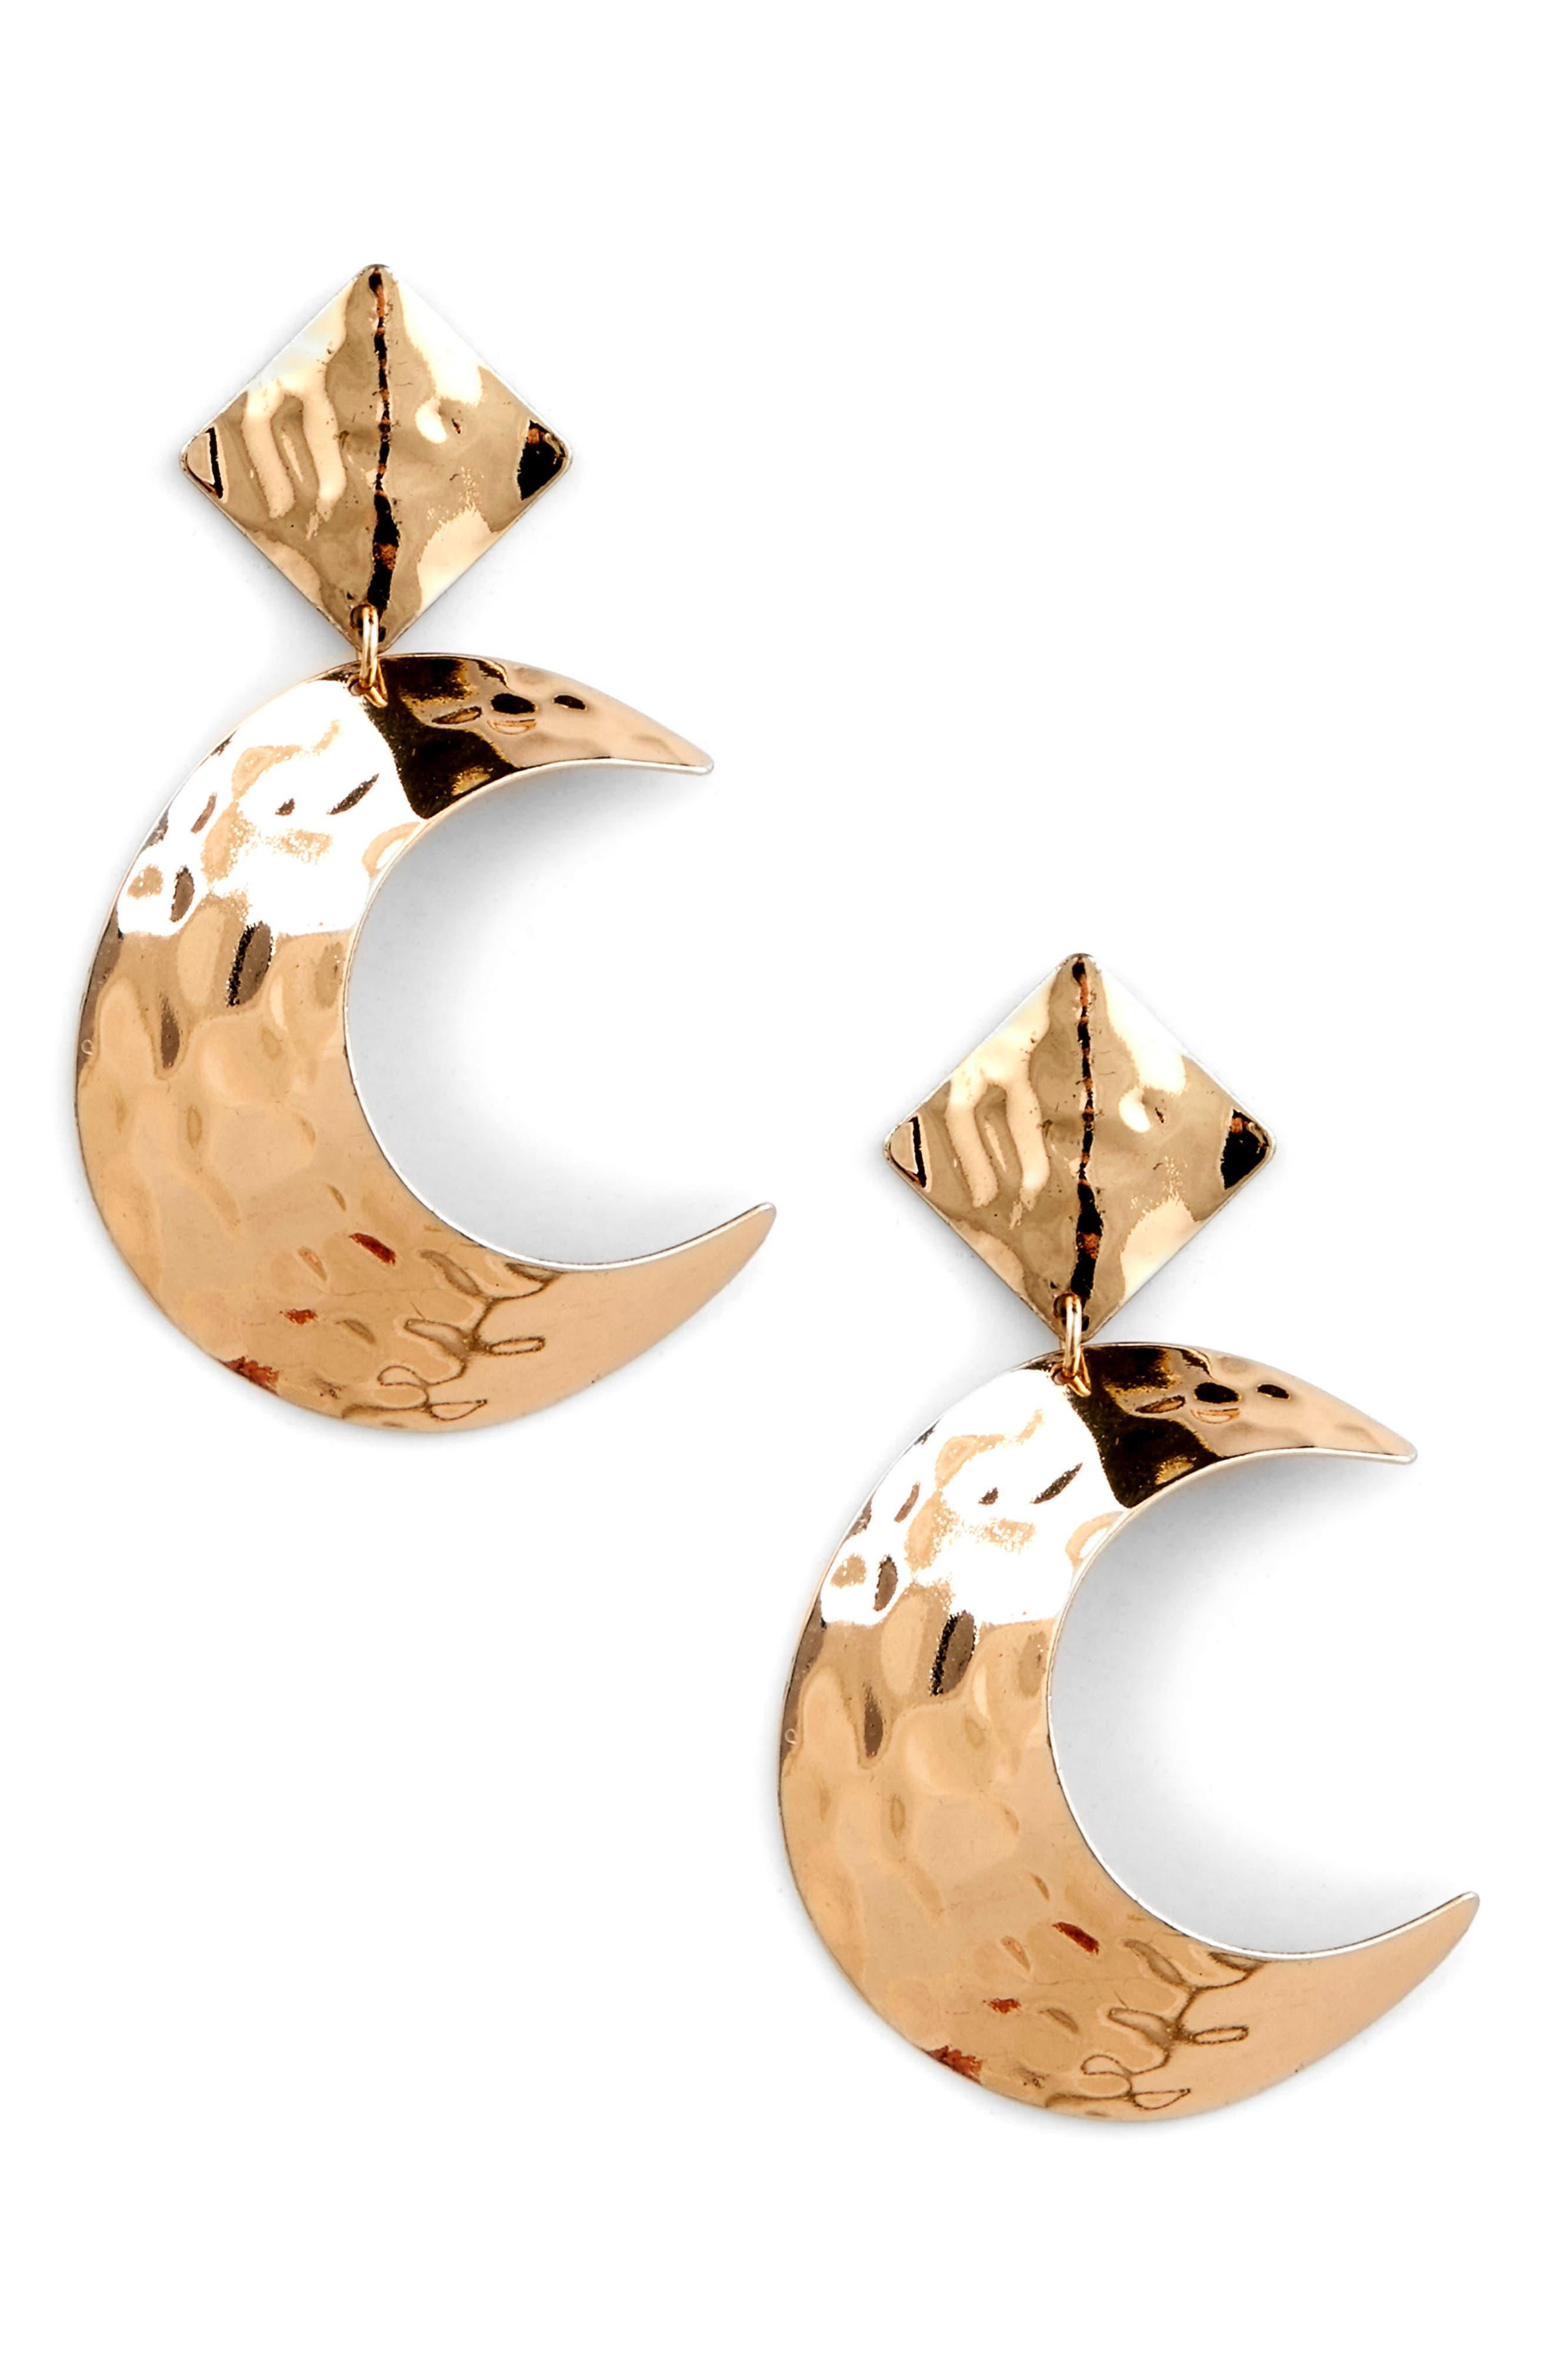 Lunar Statement Earrings,                             Main thumbnail 1, color,                             GOLD